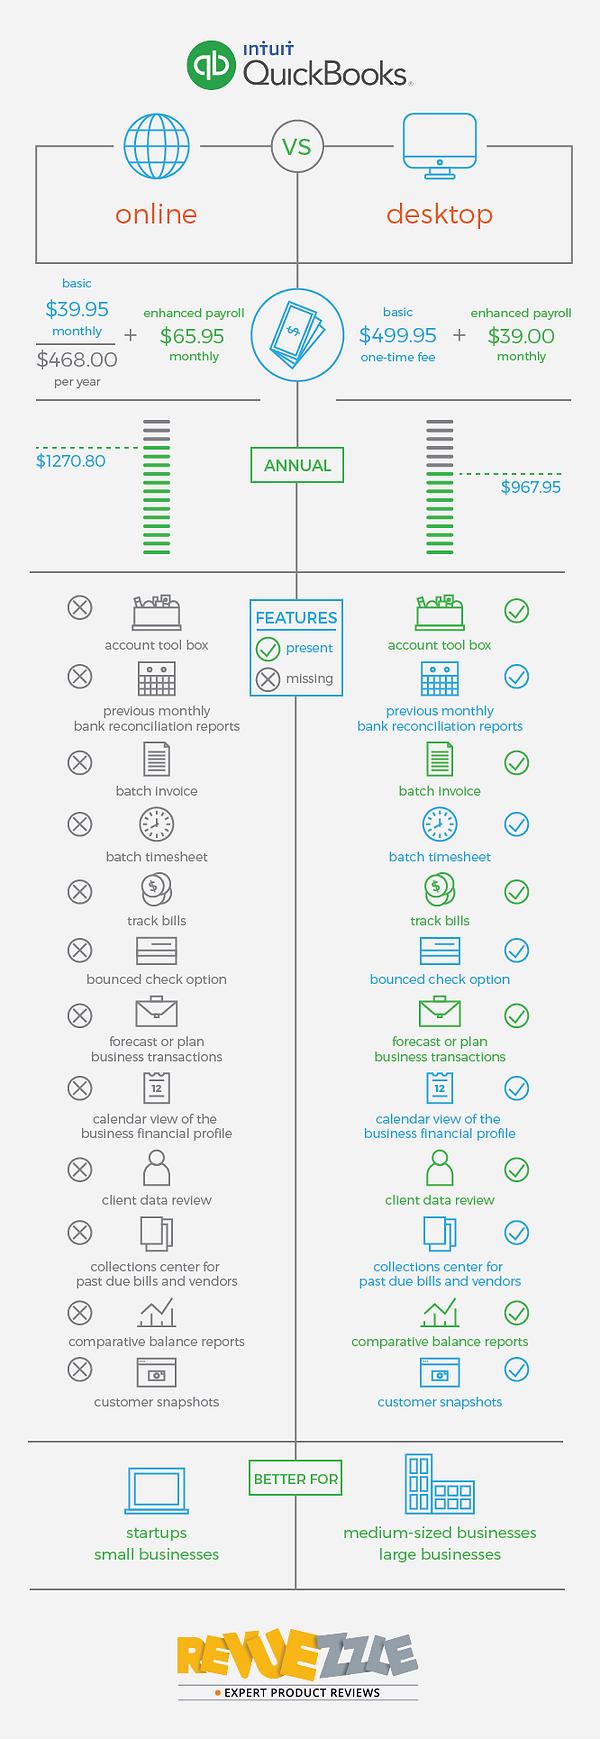 Quickbooks online vs. desktop